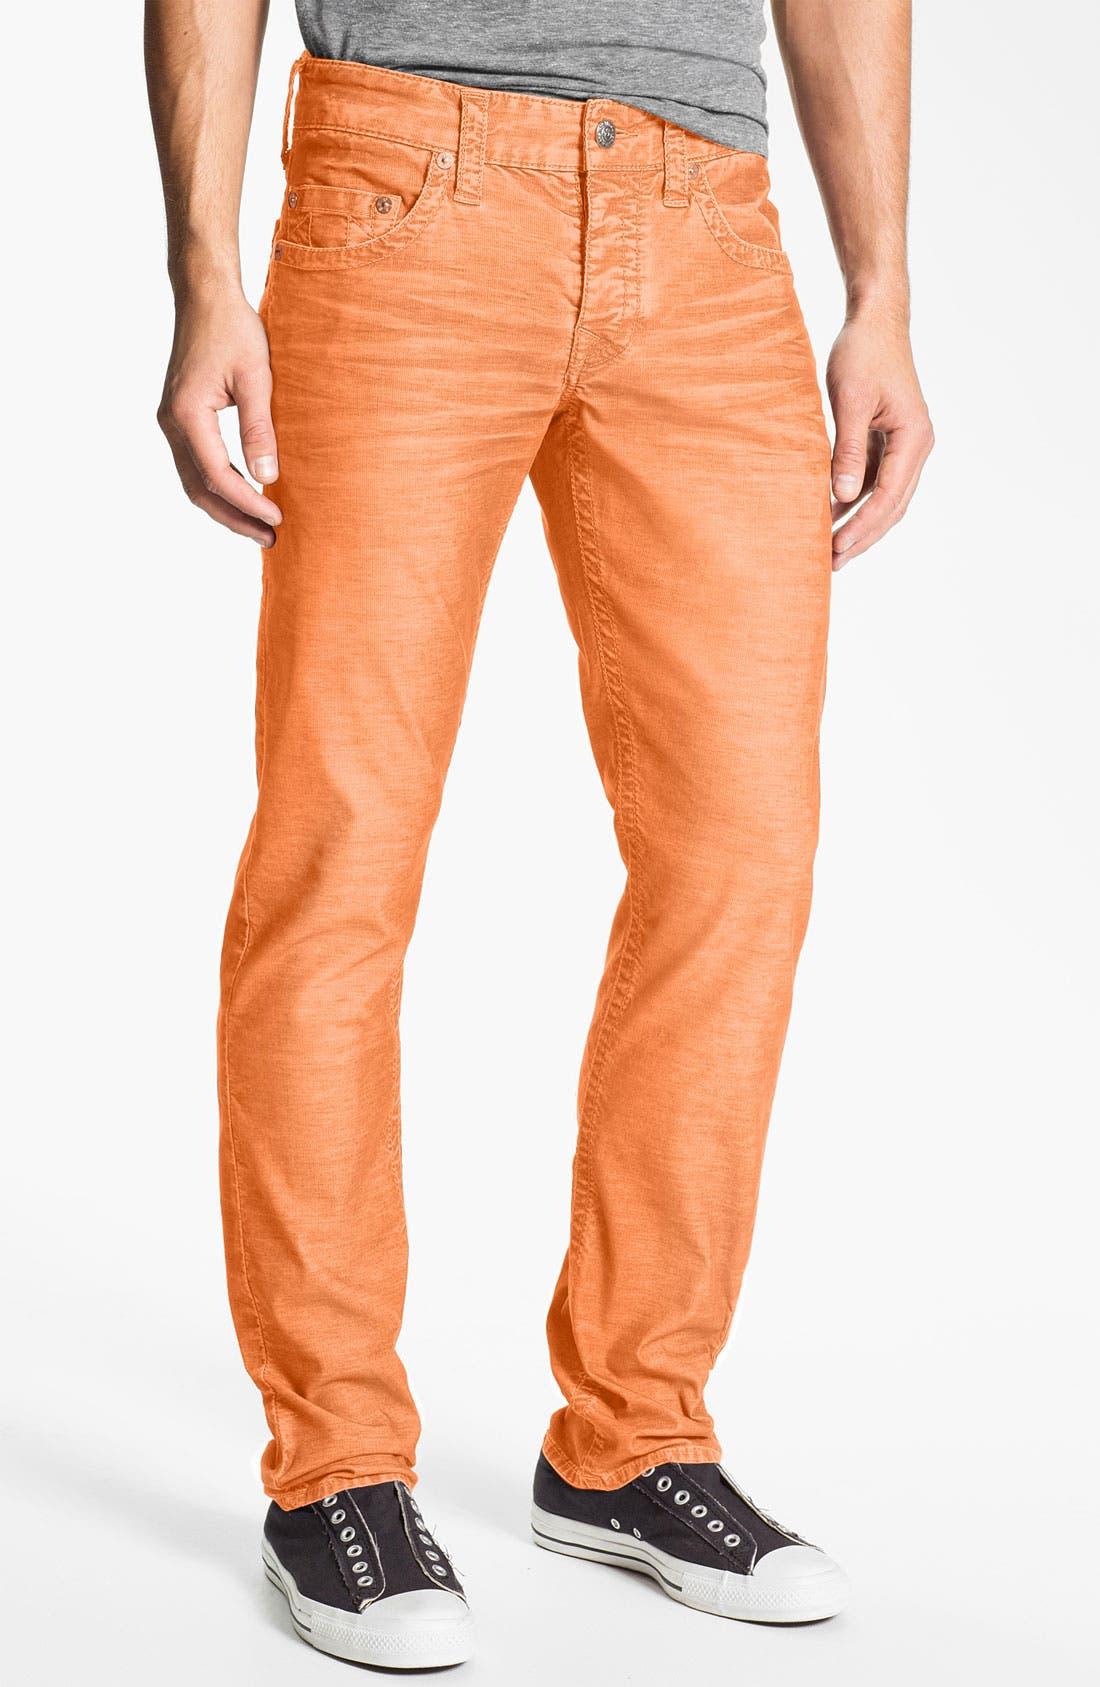 Alternate Image 2  - True Religion Brand Jeans 'Geno' Slim Corduroy Pants (Online Only)